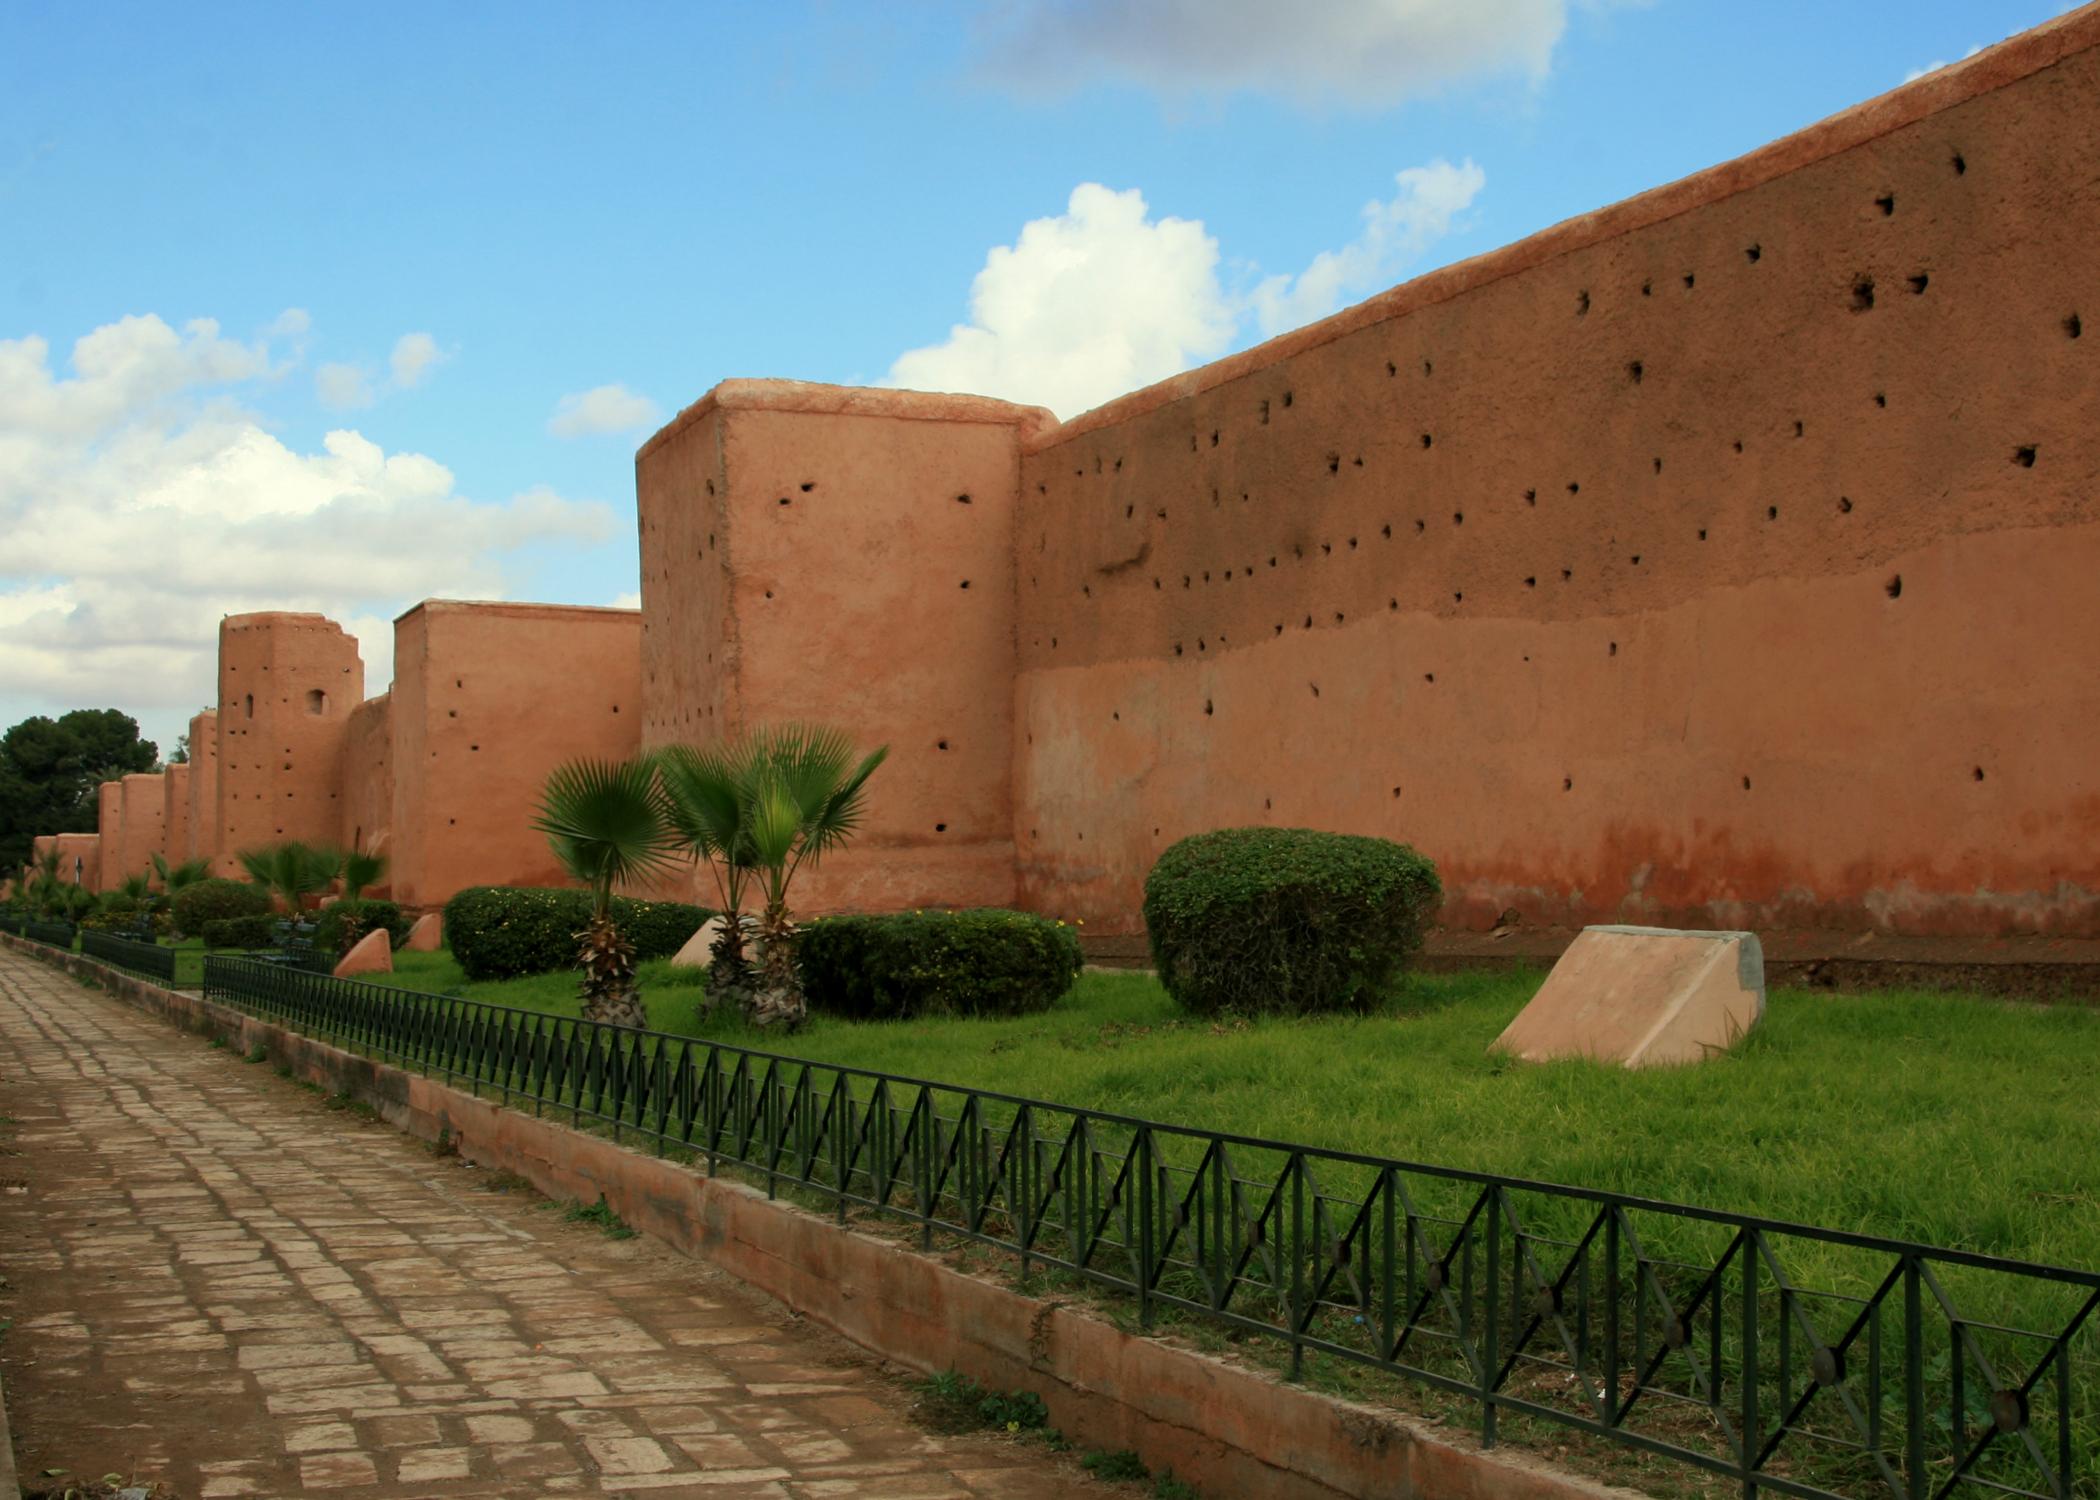 Plan Vieille Ville Marrakech